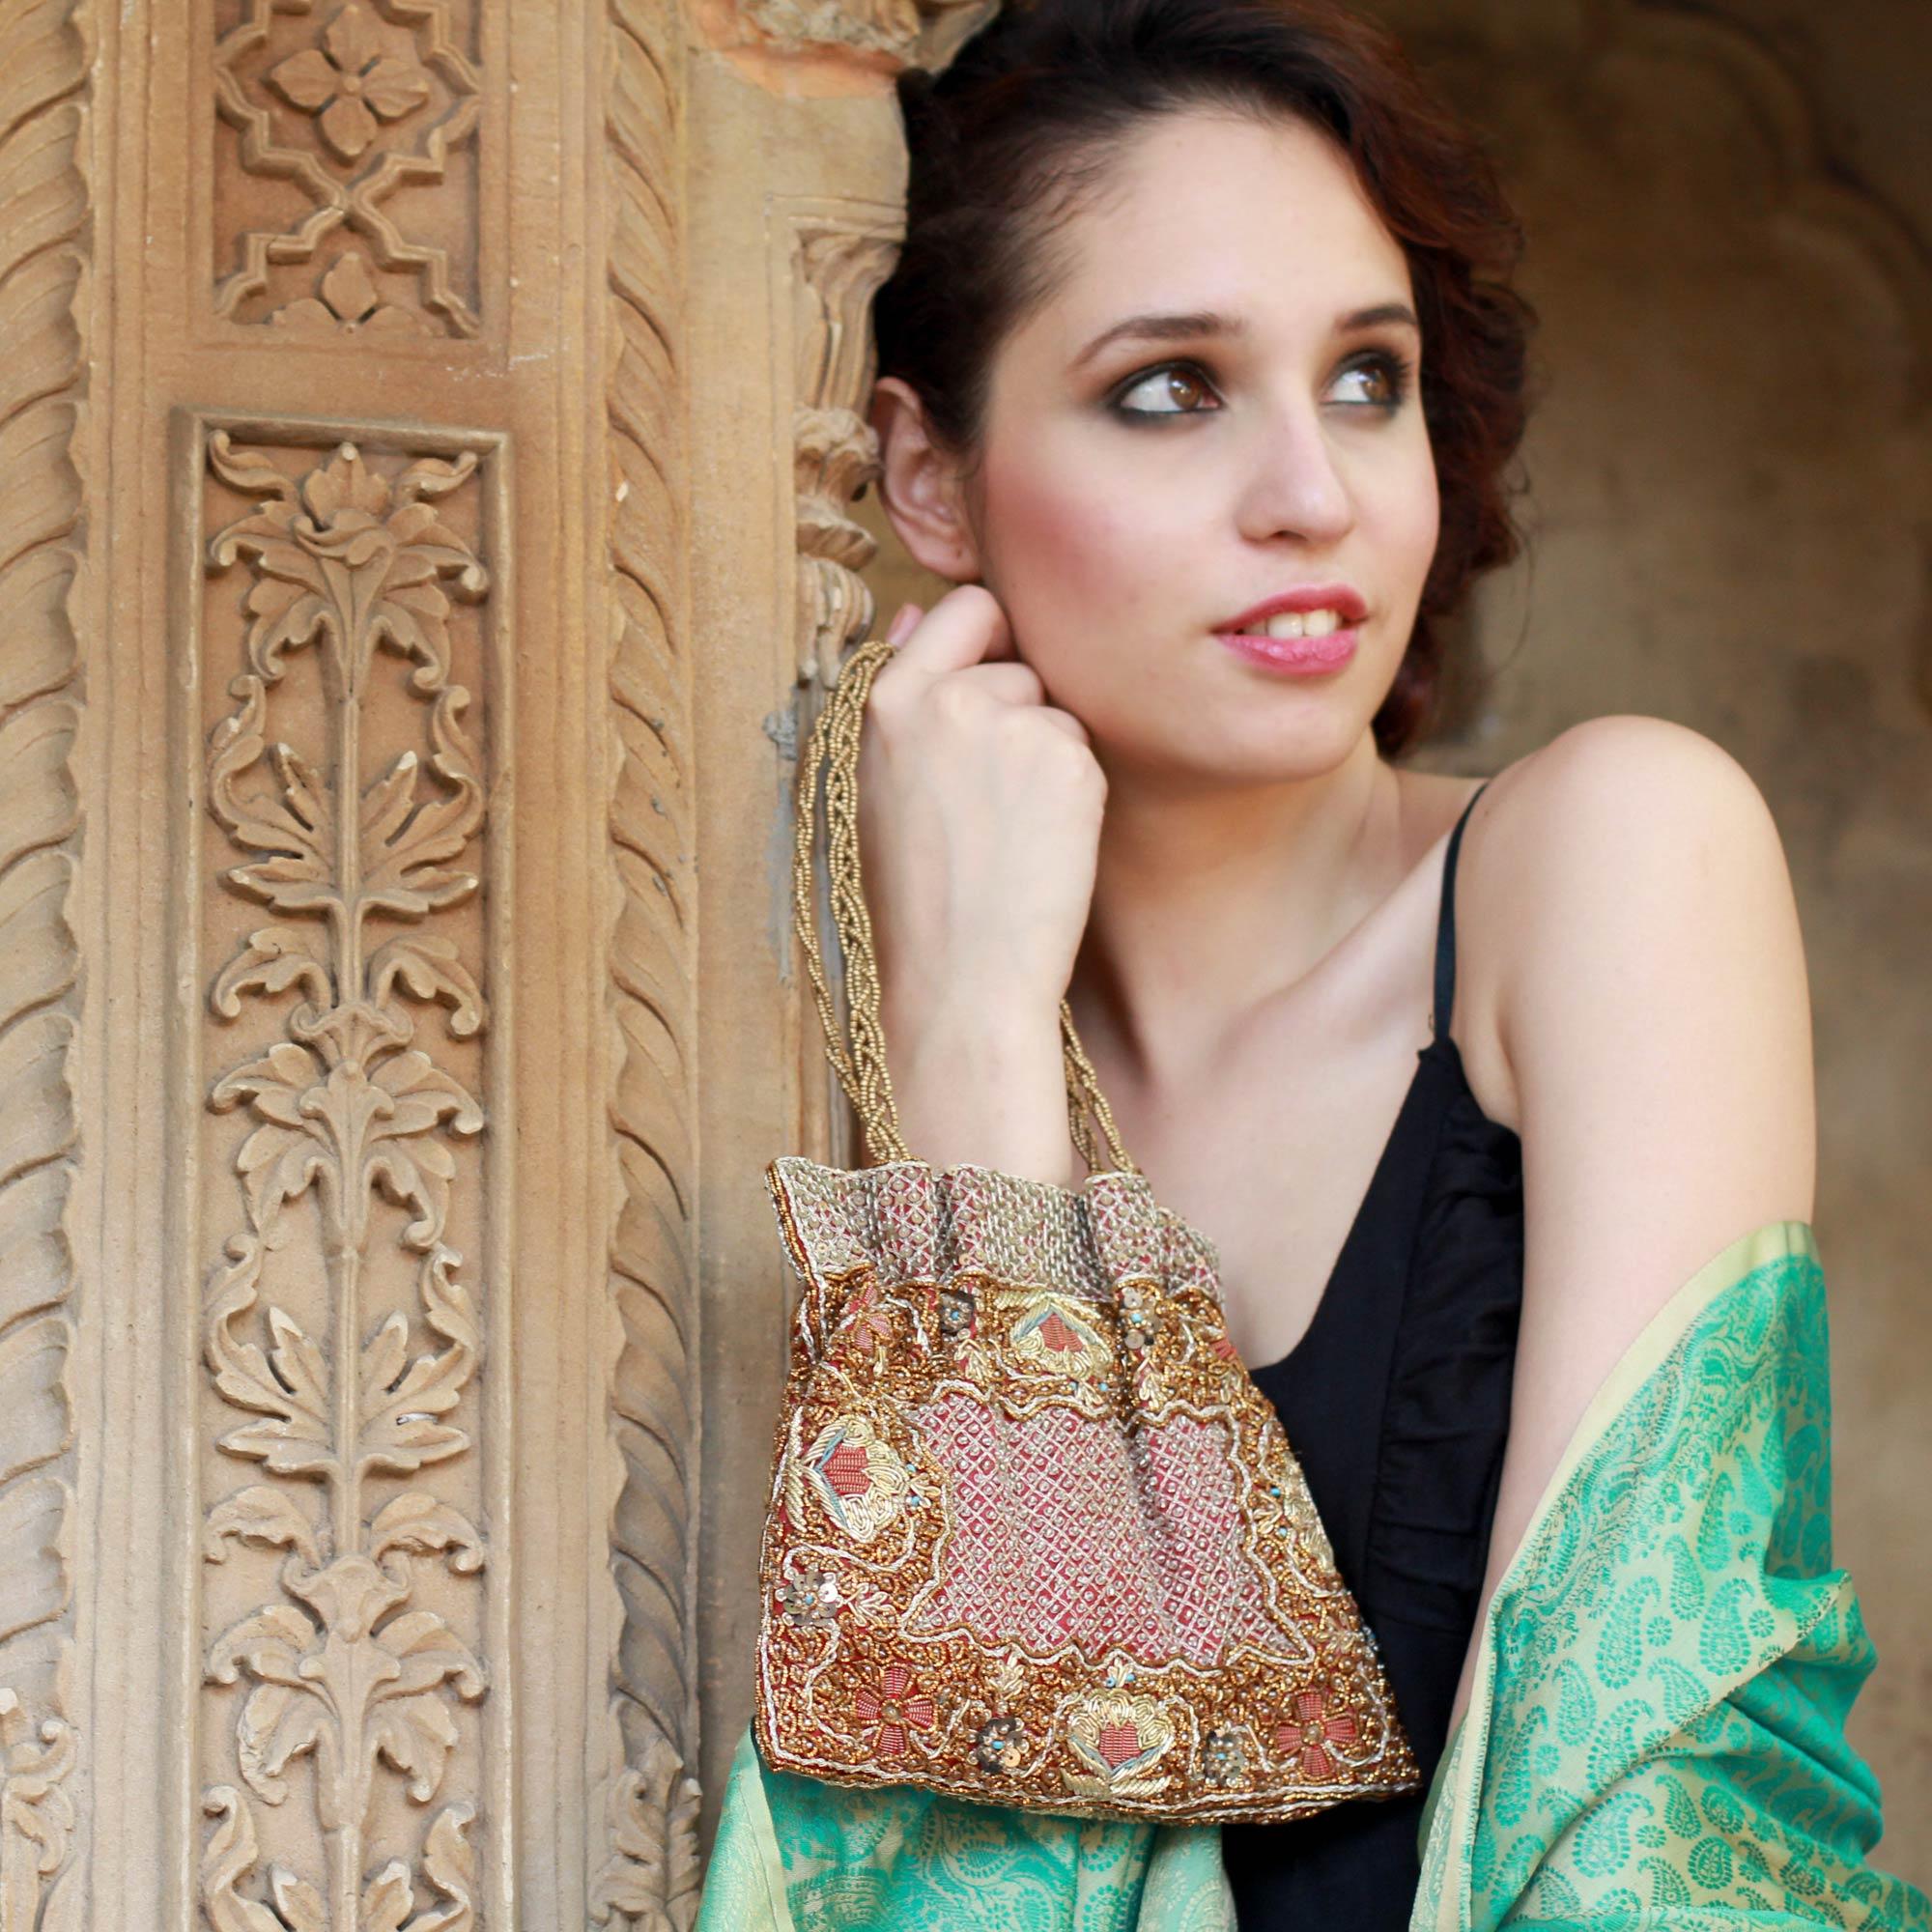 Beaded evening bag, 'Mughal Treasure' NOVICA zardozi embroidery and lavish beadwork handbag